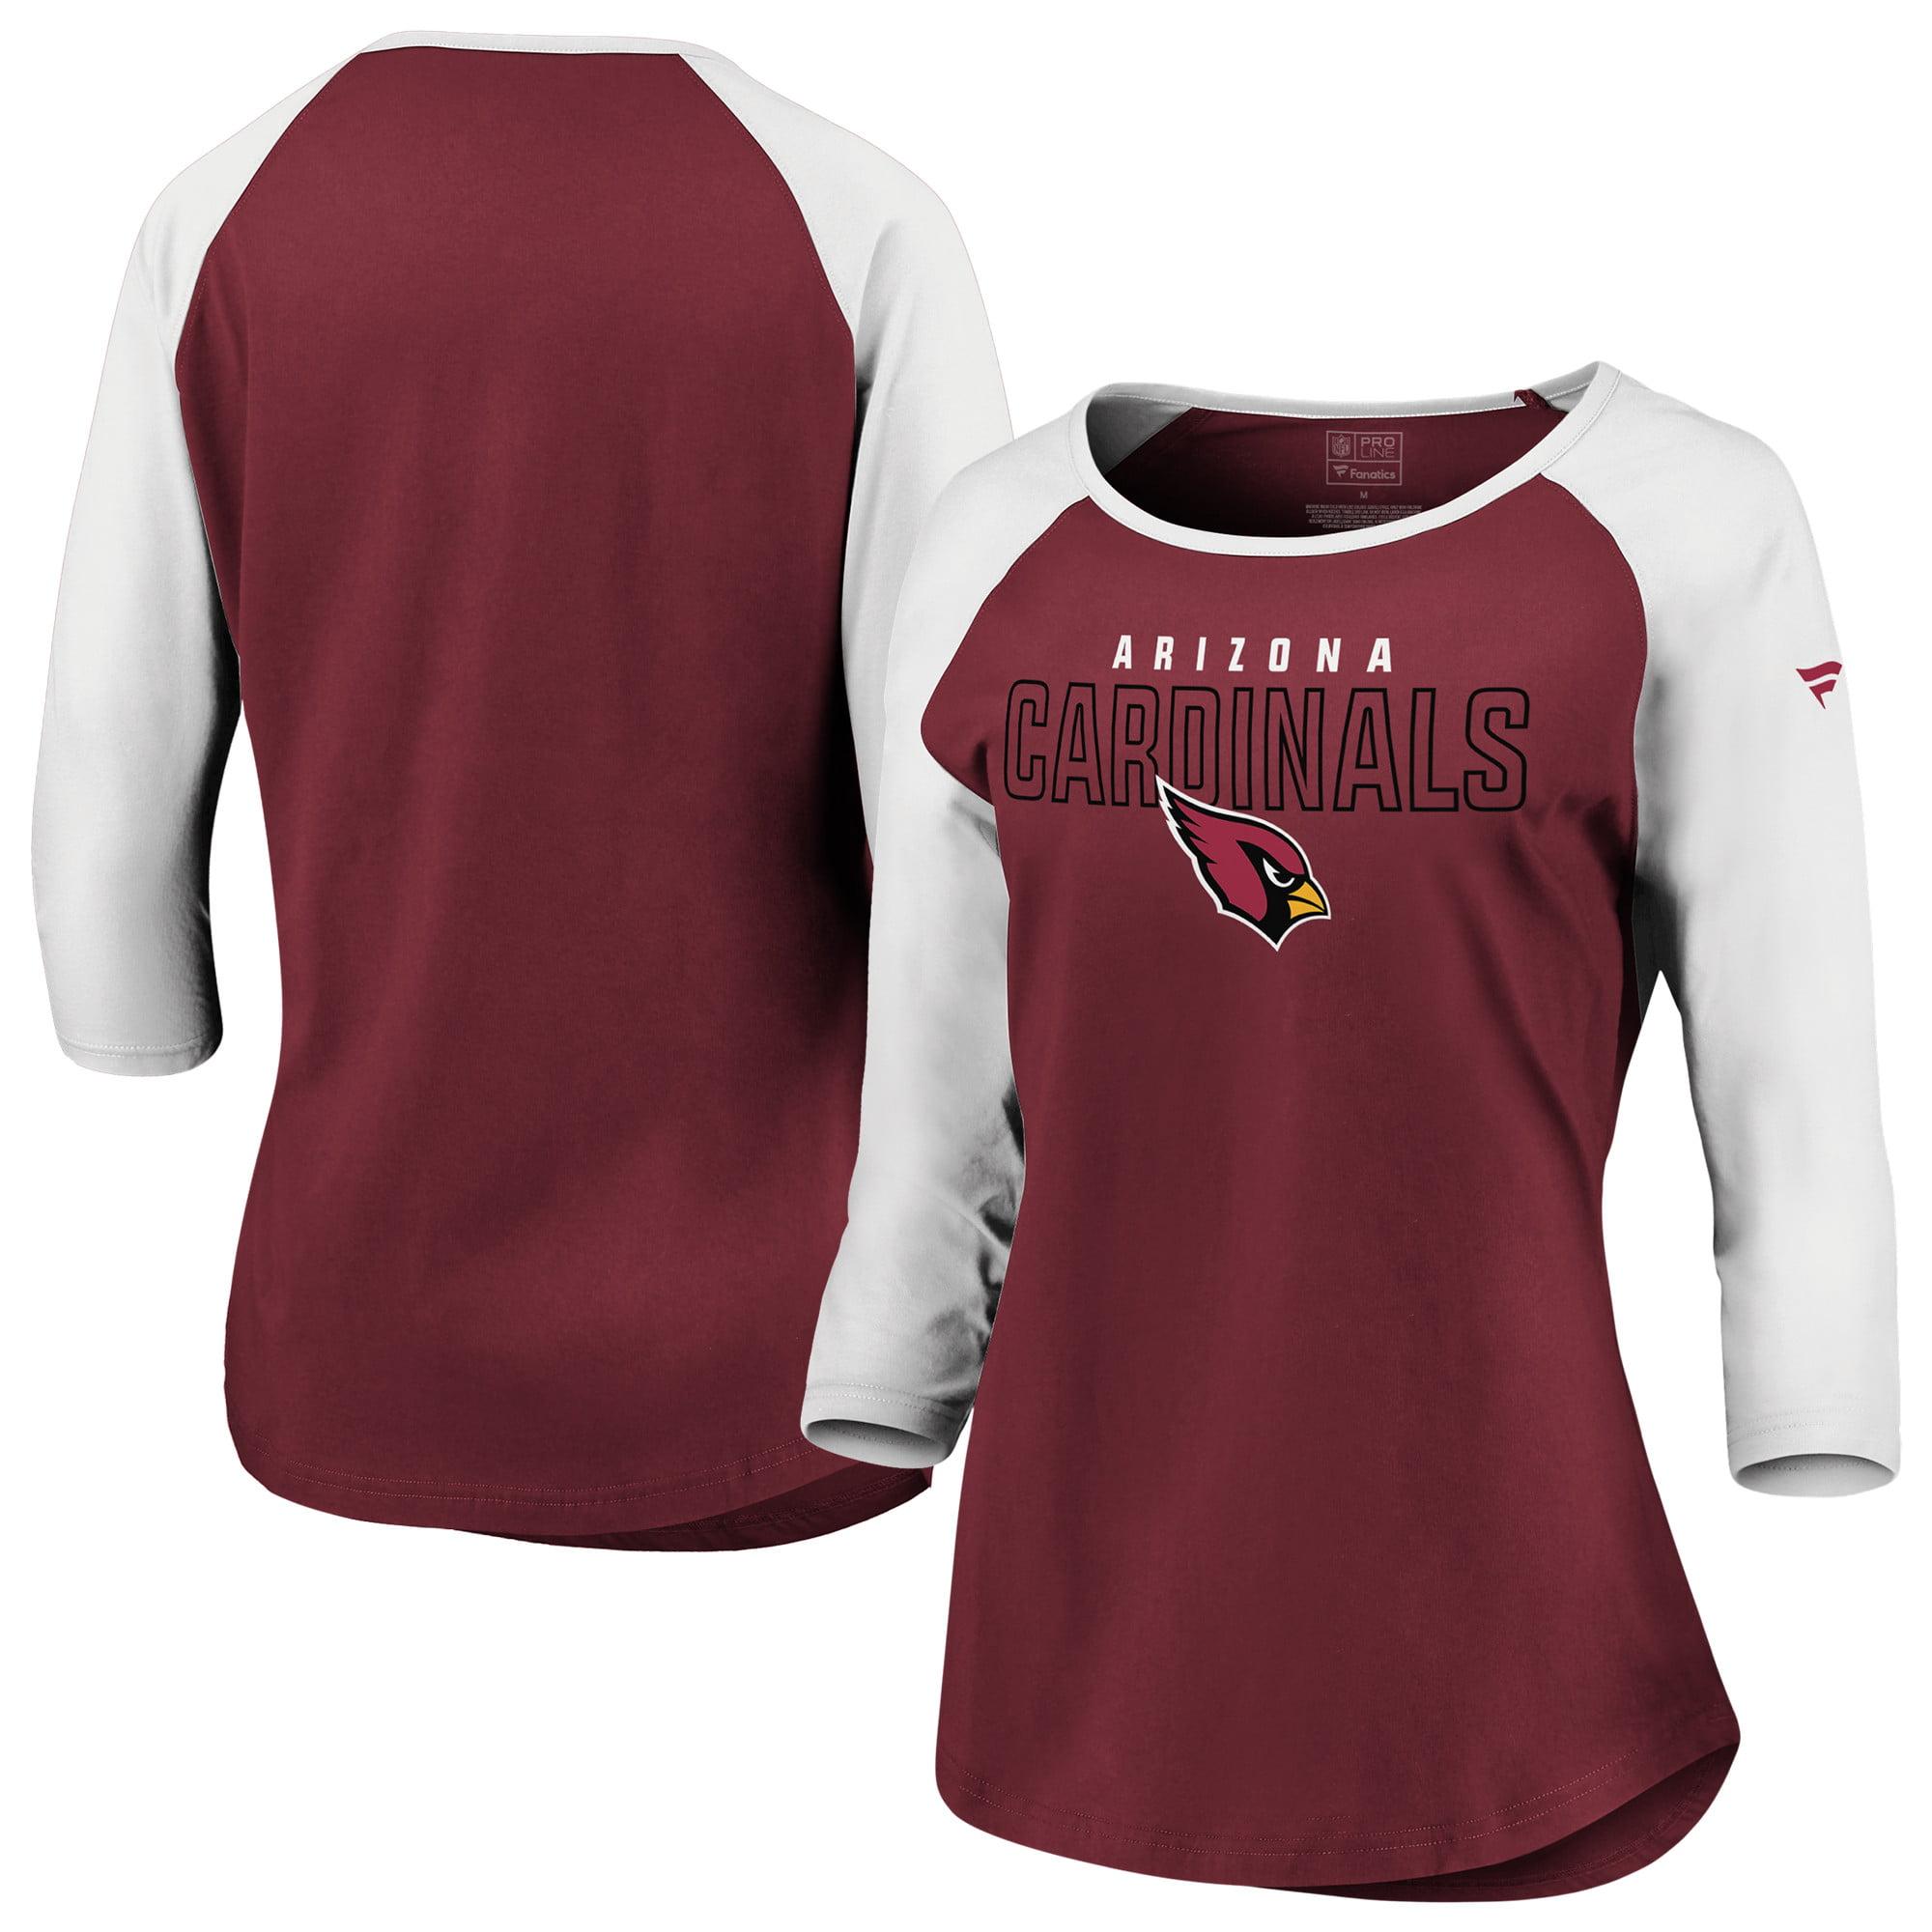 0af34106 Arizona Cardinals NFL Pro Line by Fanatics Branded Women's Iconic Color  Block 3/4-Sleeve Raglan T-Shirt - Cardinal/White